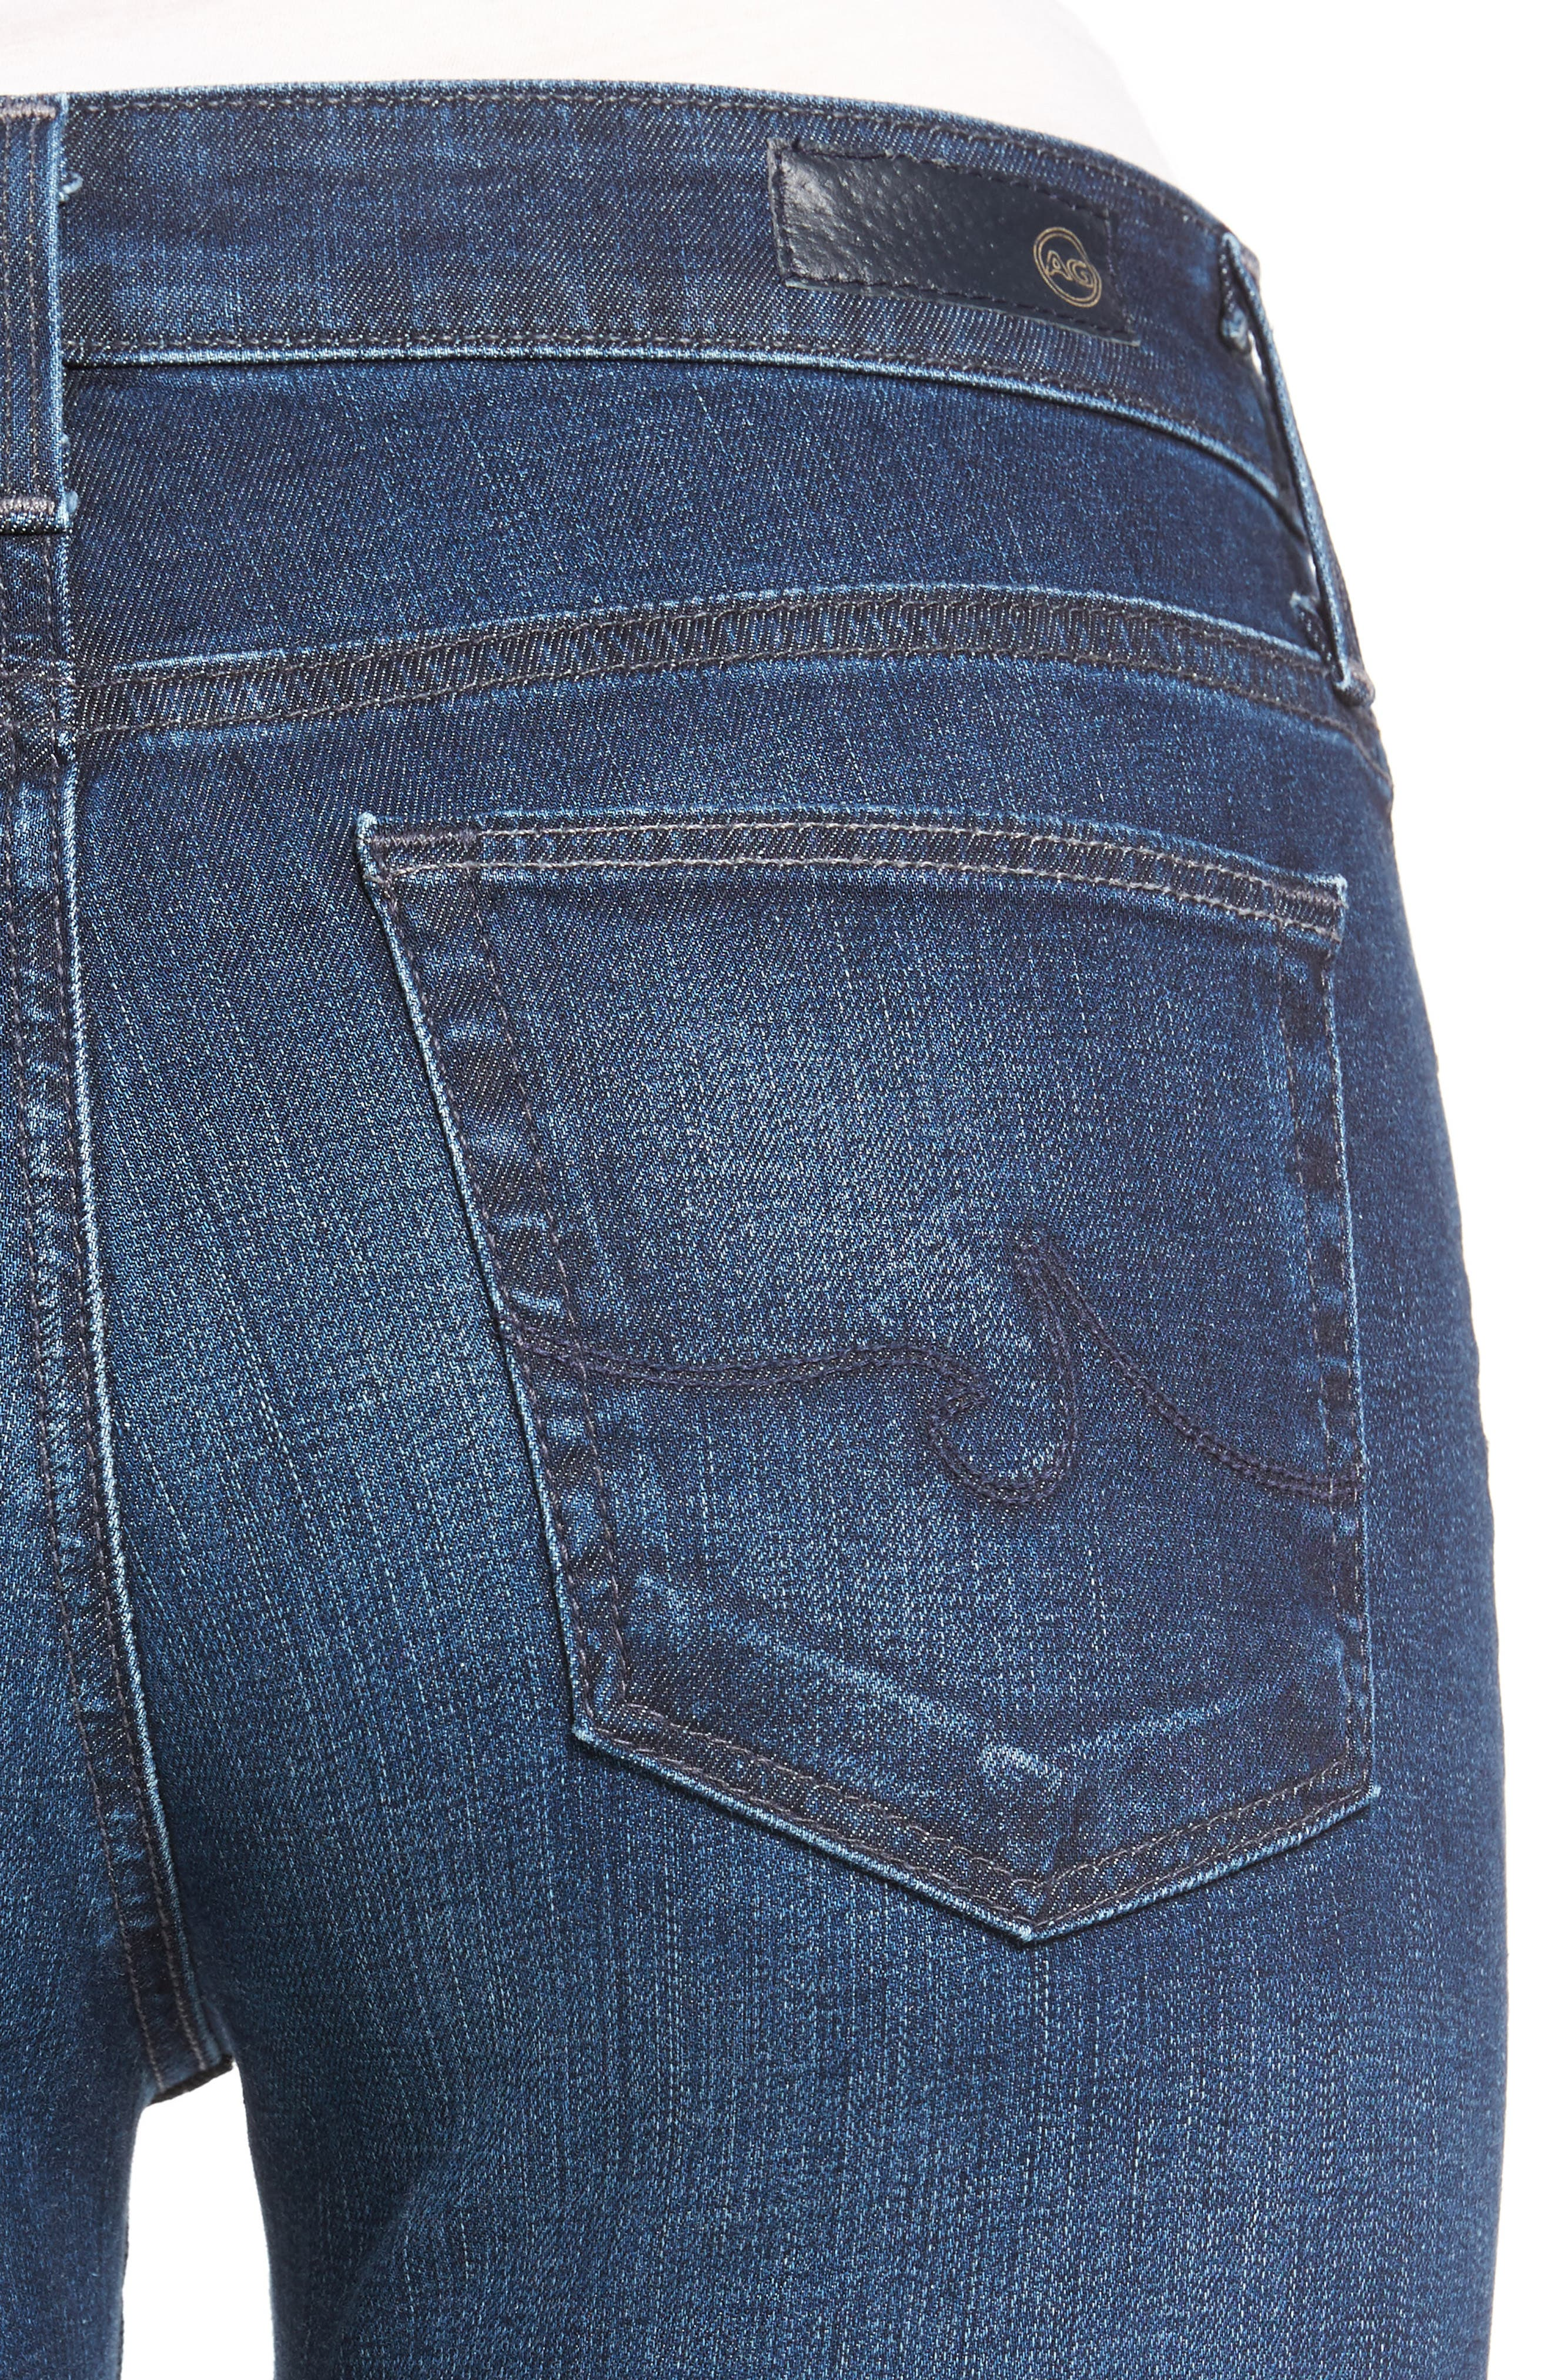 'The Farrah' High Rise Skinny Jeans,                             Alternate thumbnail 38, color,